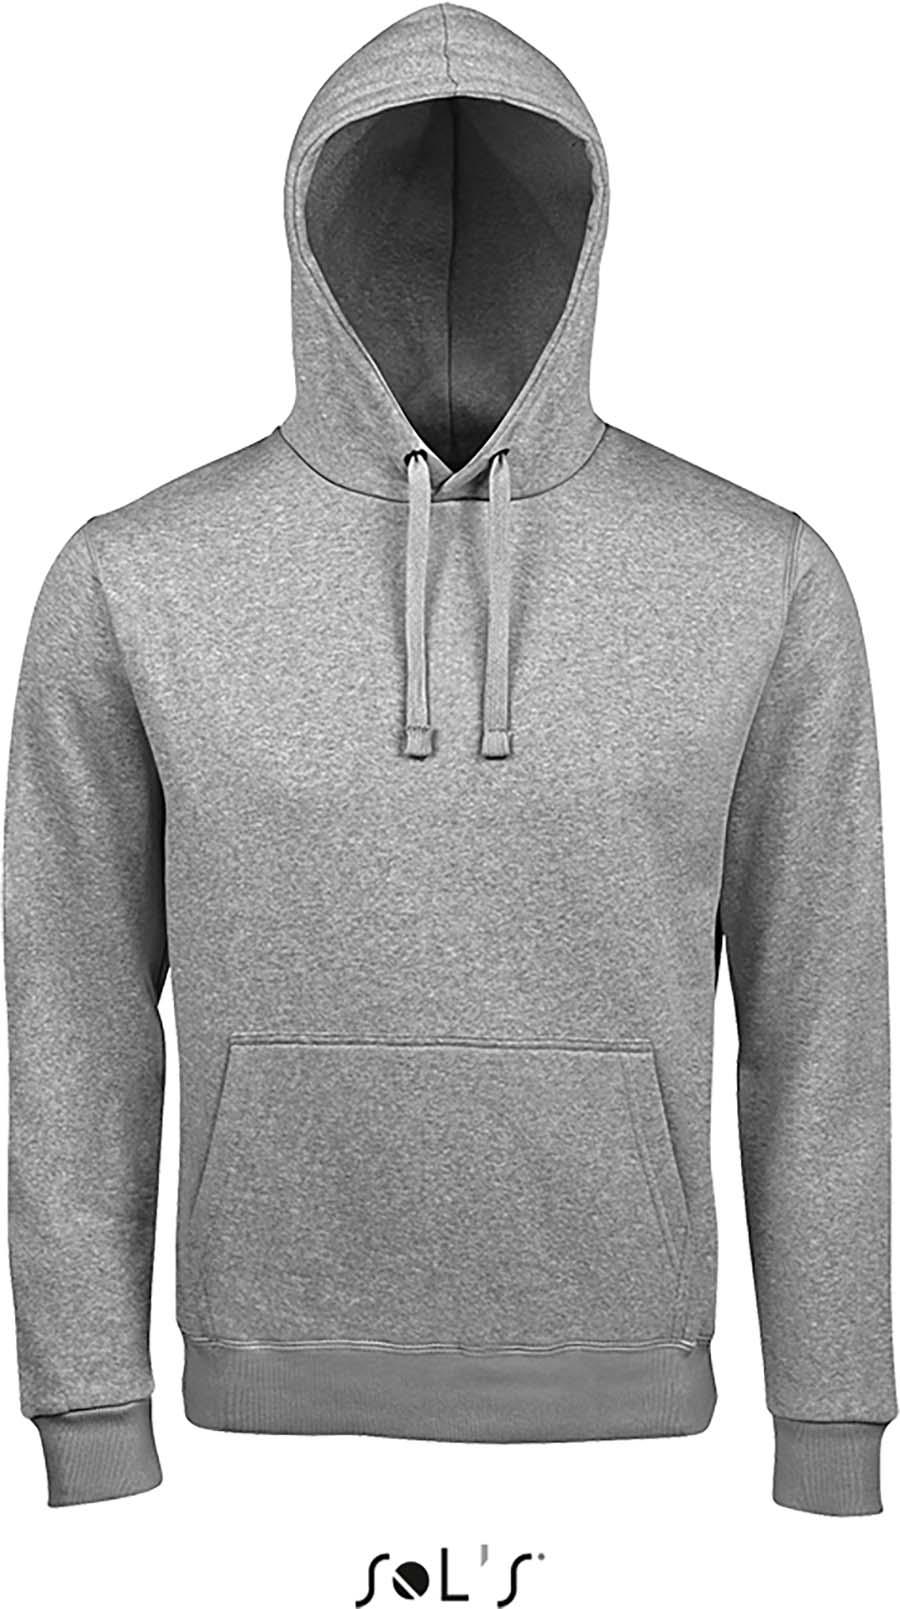 Sweat-shirt unisexe à capuche - 1-1403-6